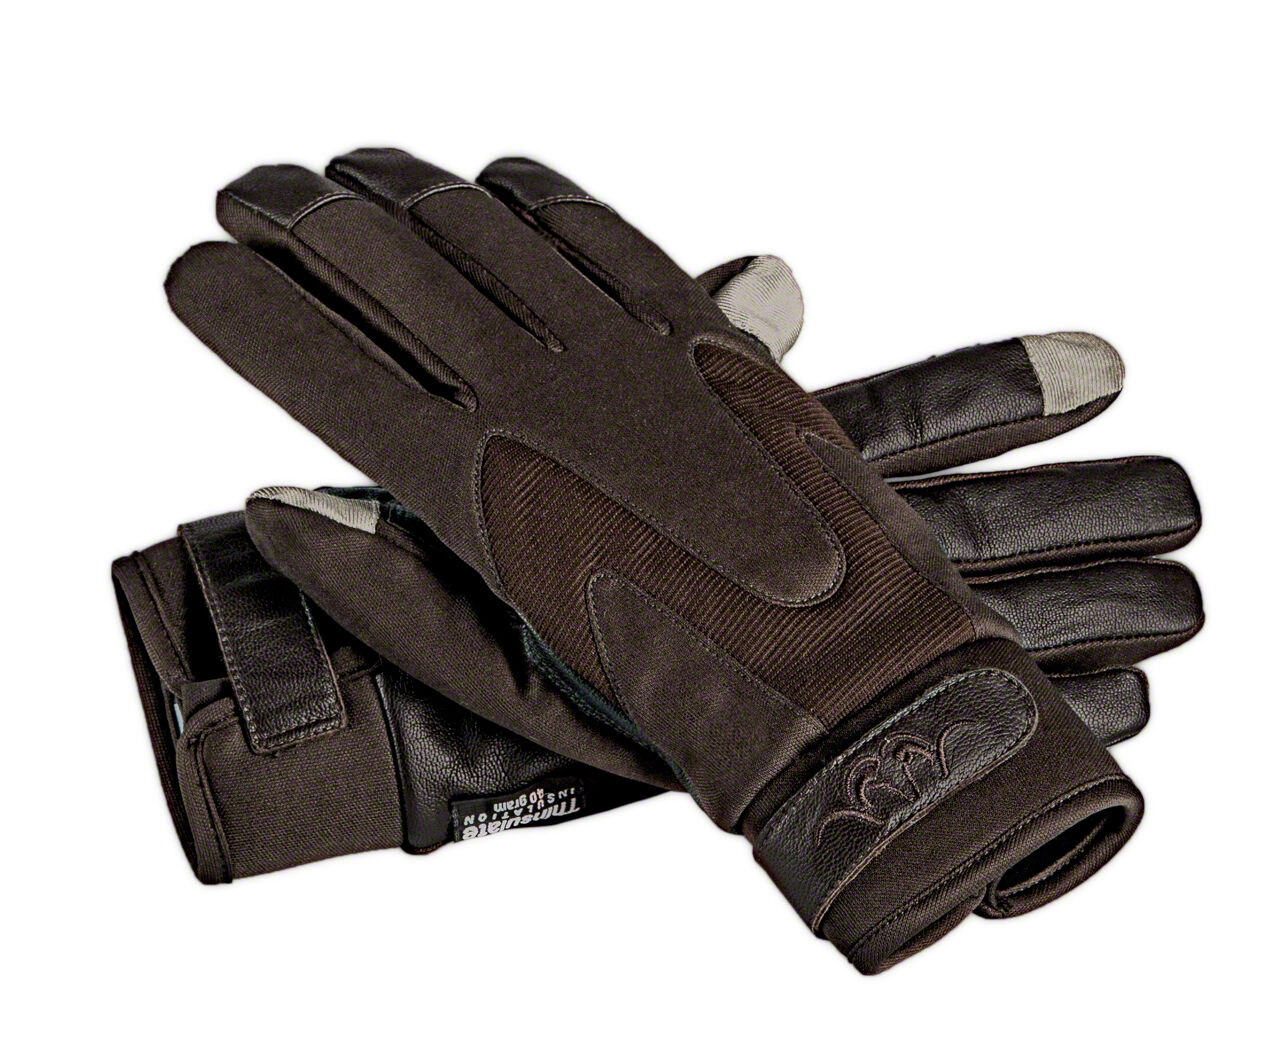 Blaser Smartphone Handschuhe Handschuhe Smartphone RAMSHELL TOUCH - 115087-011 85e3b0